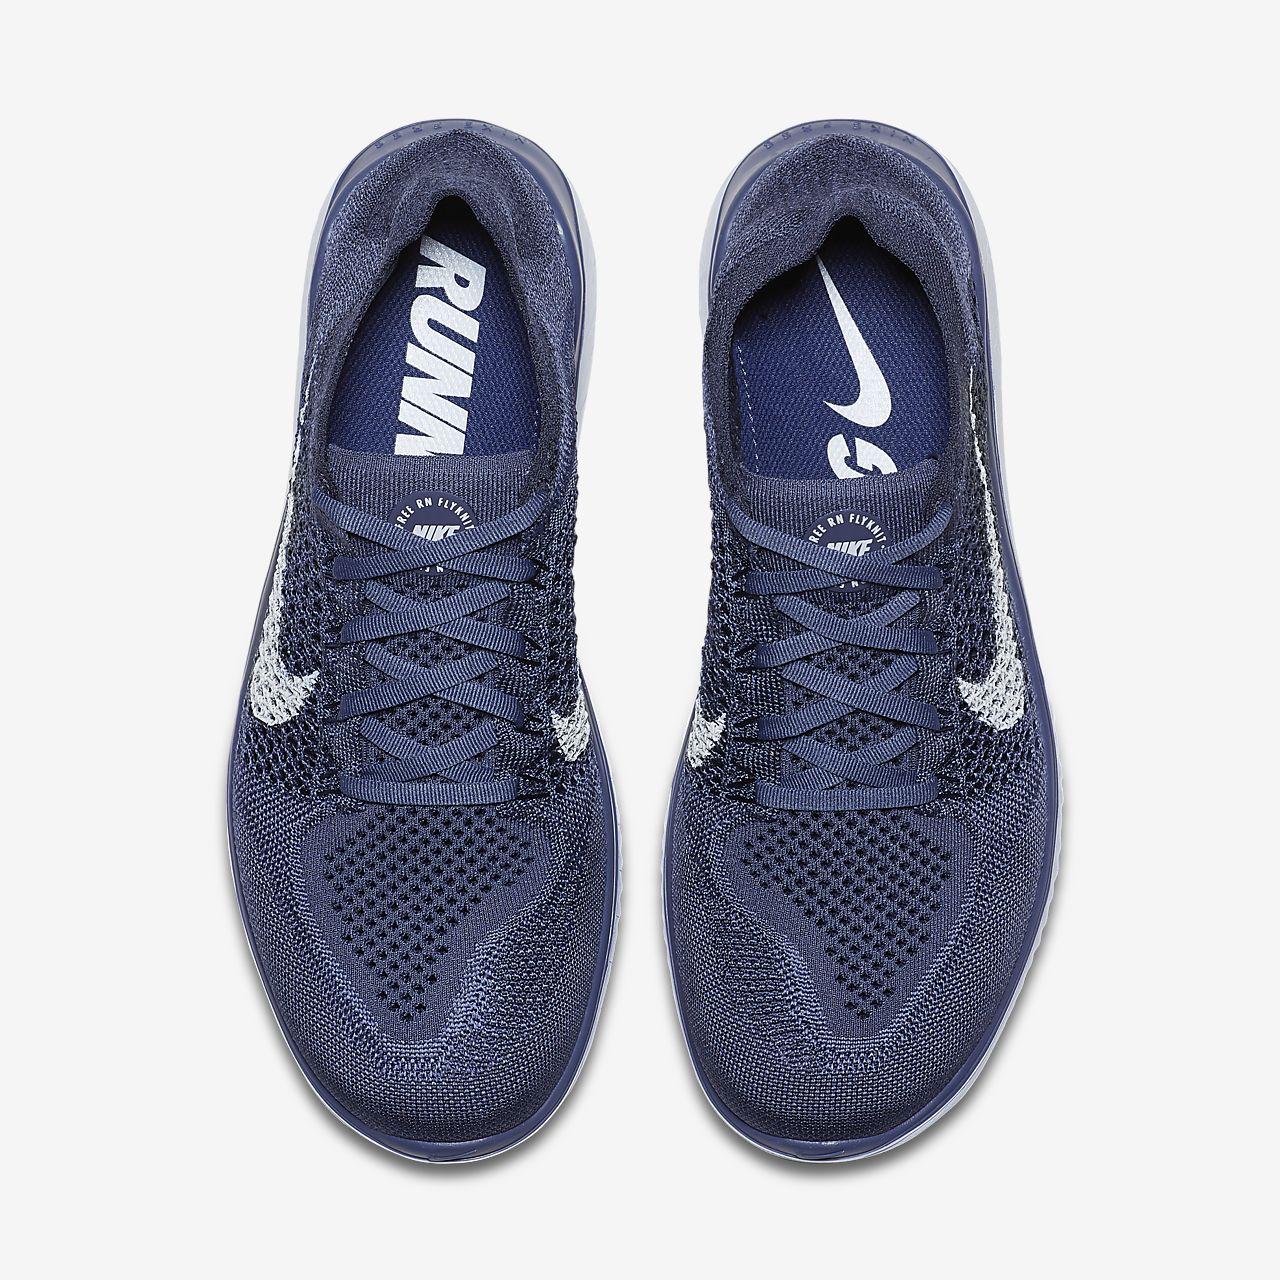 ad1bdbe1c26 Nike Free RN Flyknit 2018 Men s Running Shoe. Nike.com IE